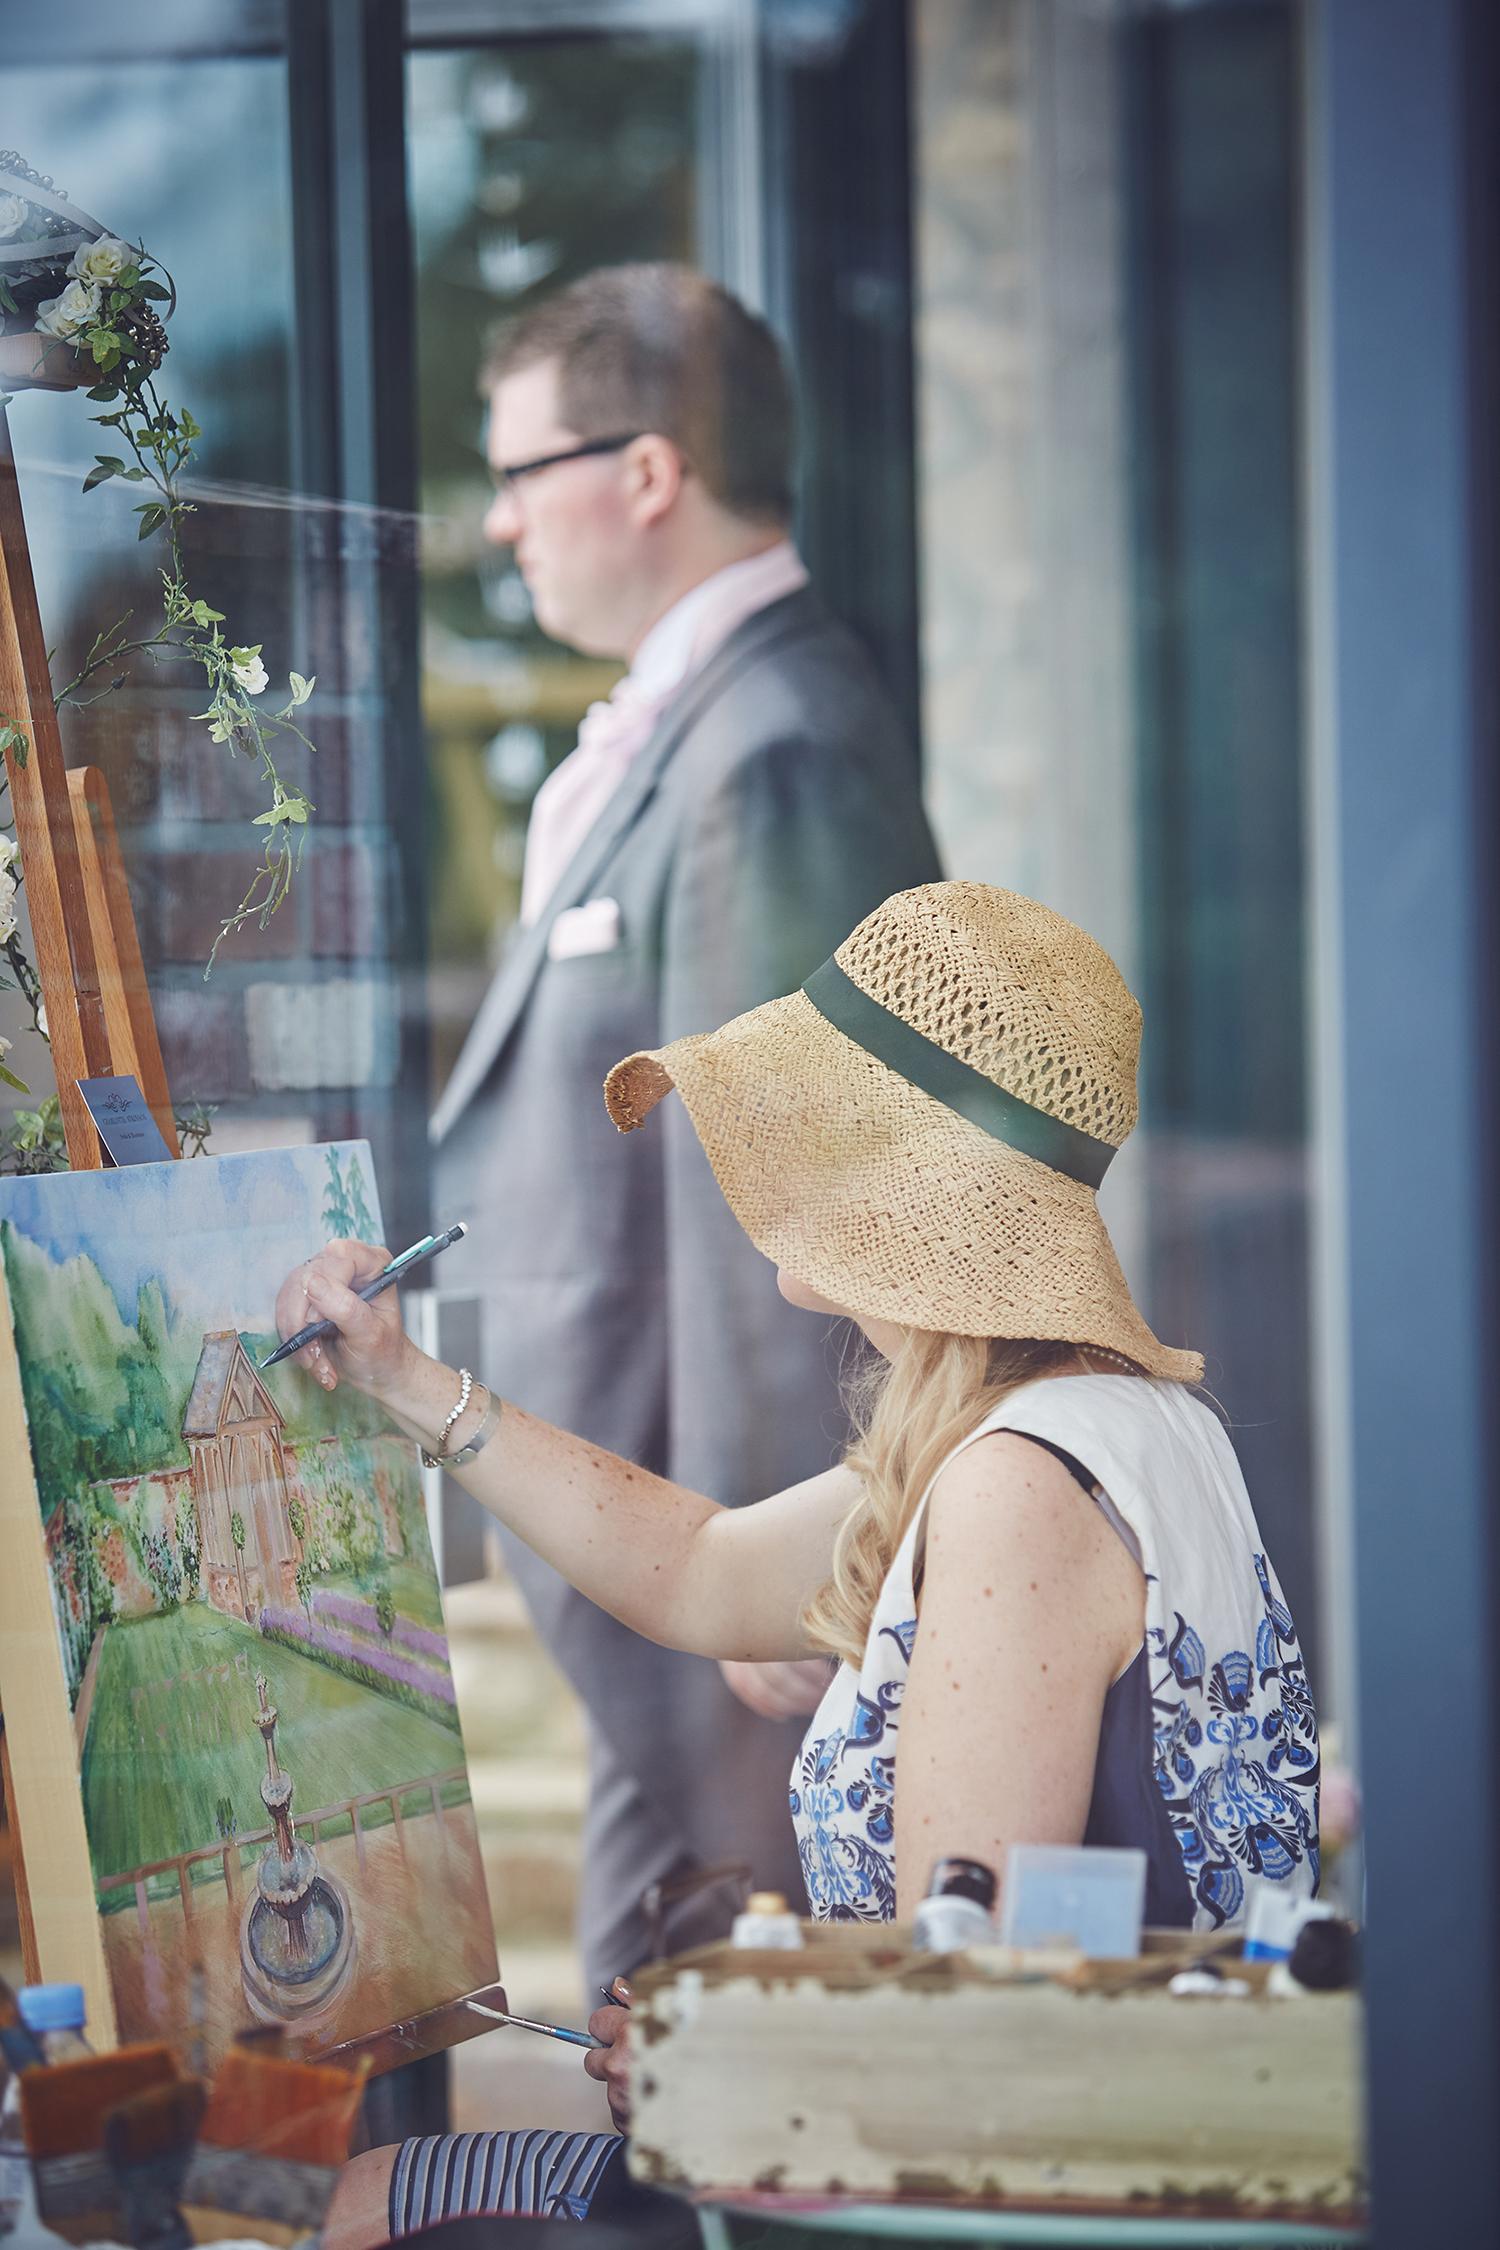 artist paints the garden